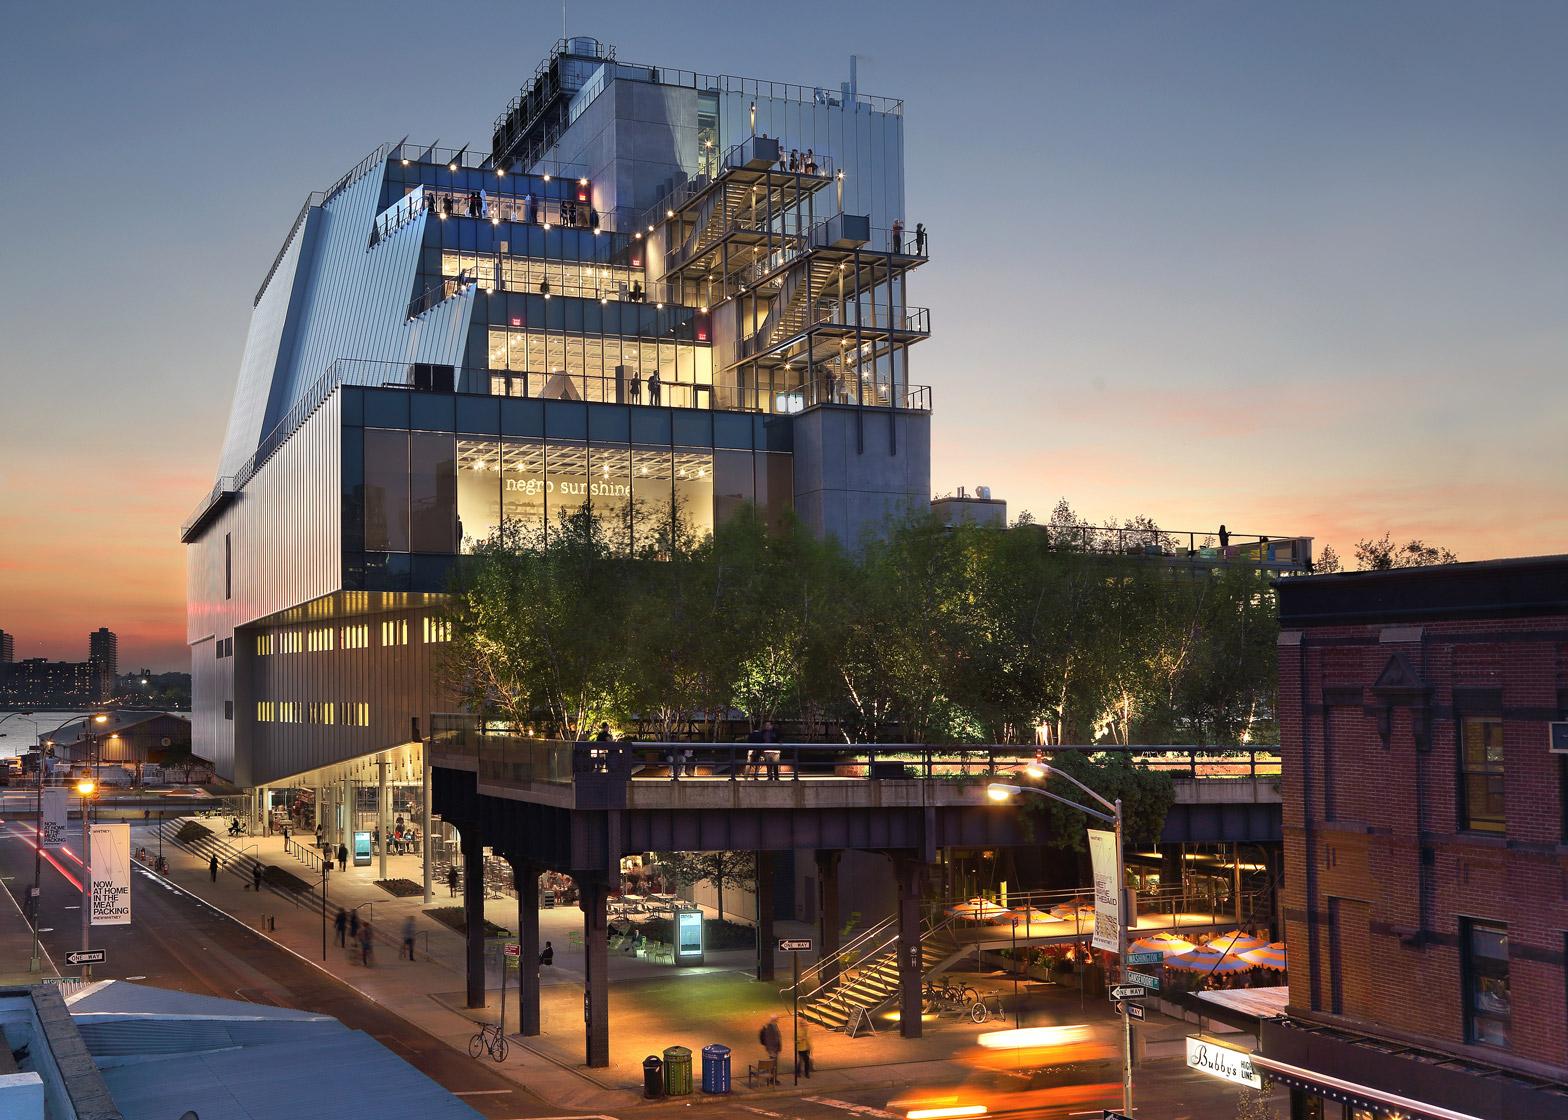 Whitney Museum of American Art by Renzo Piano